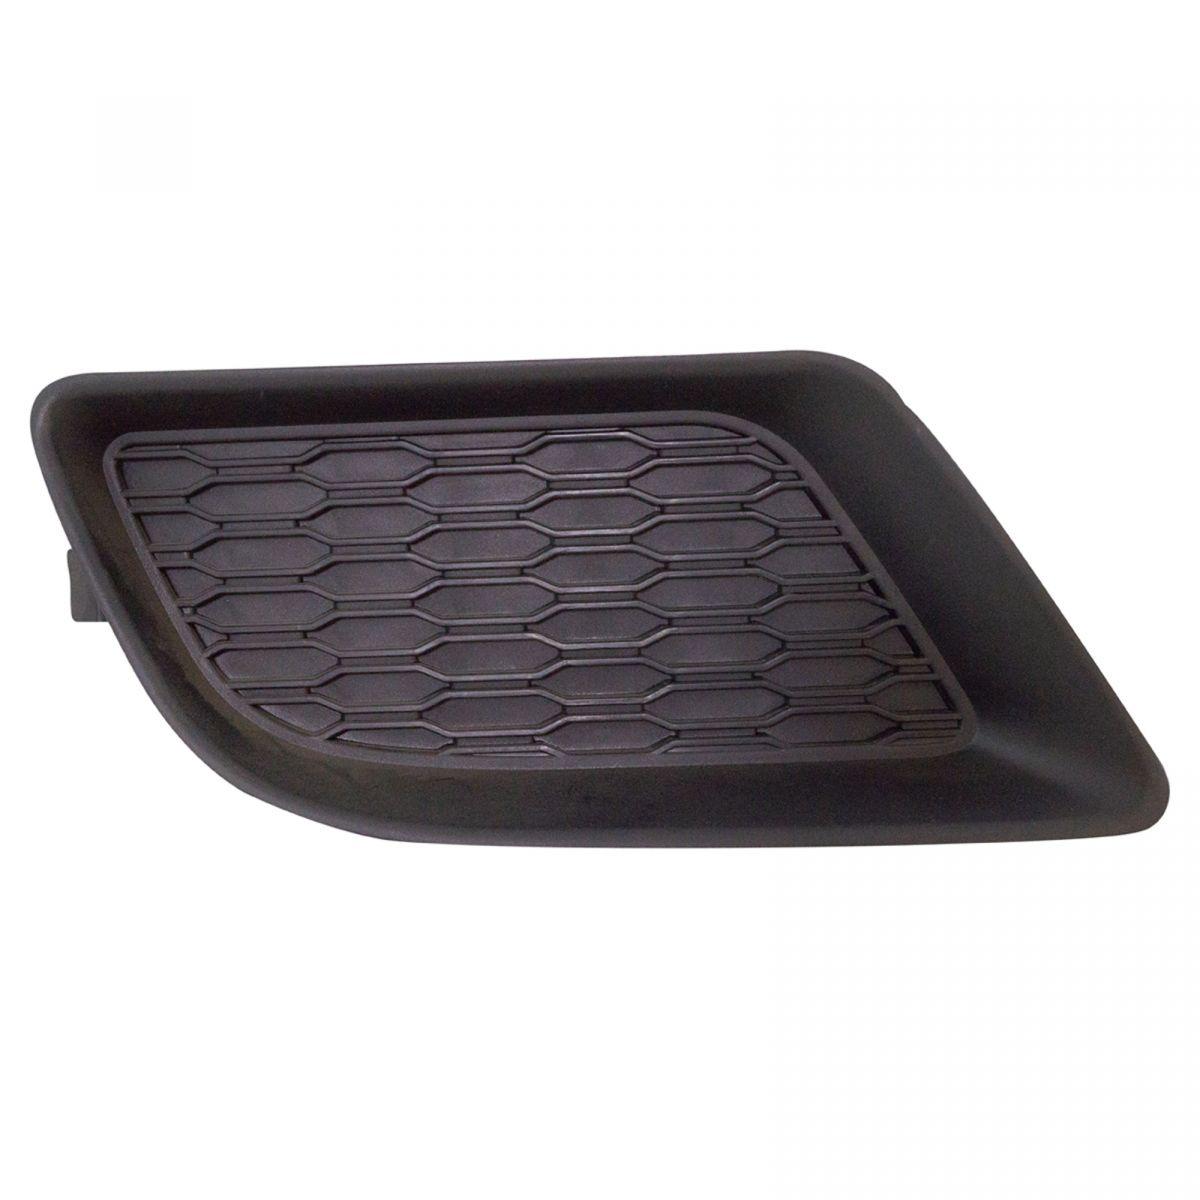 Textured Black For Charger 11-14 Plastic Driver Side Fog Light Trim